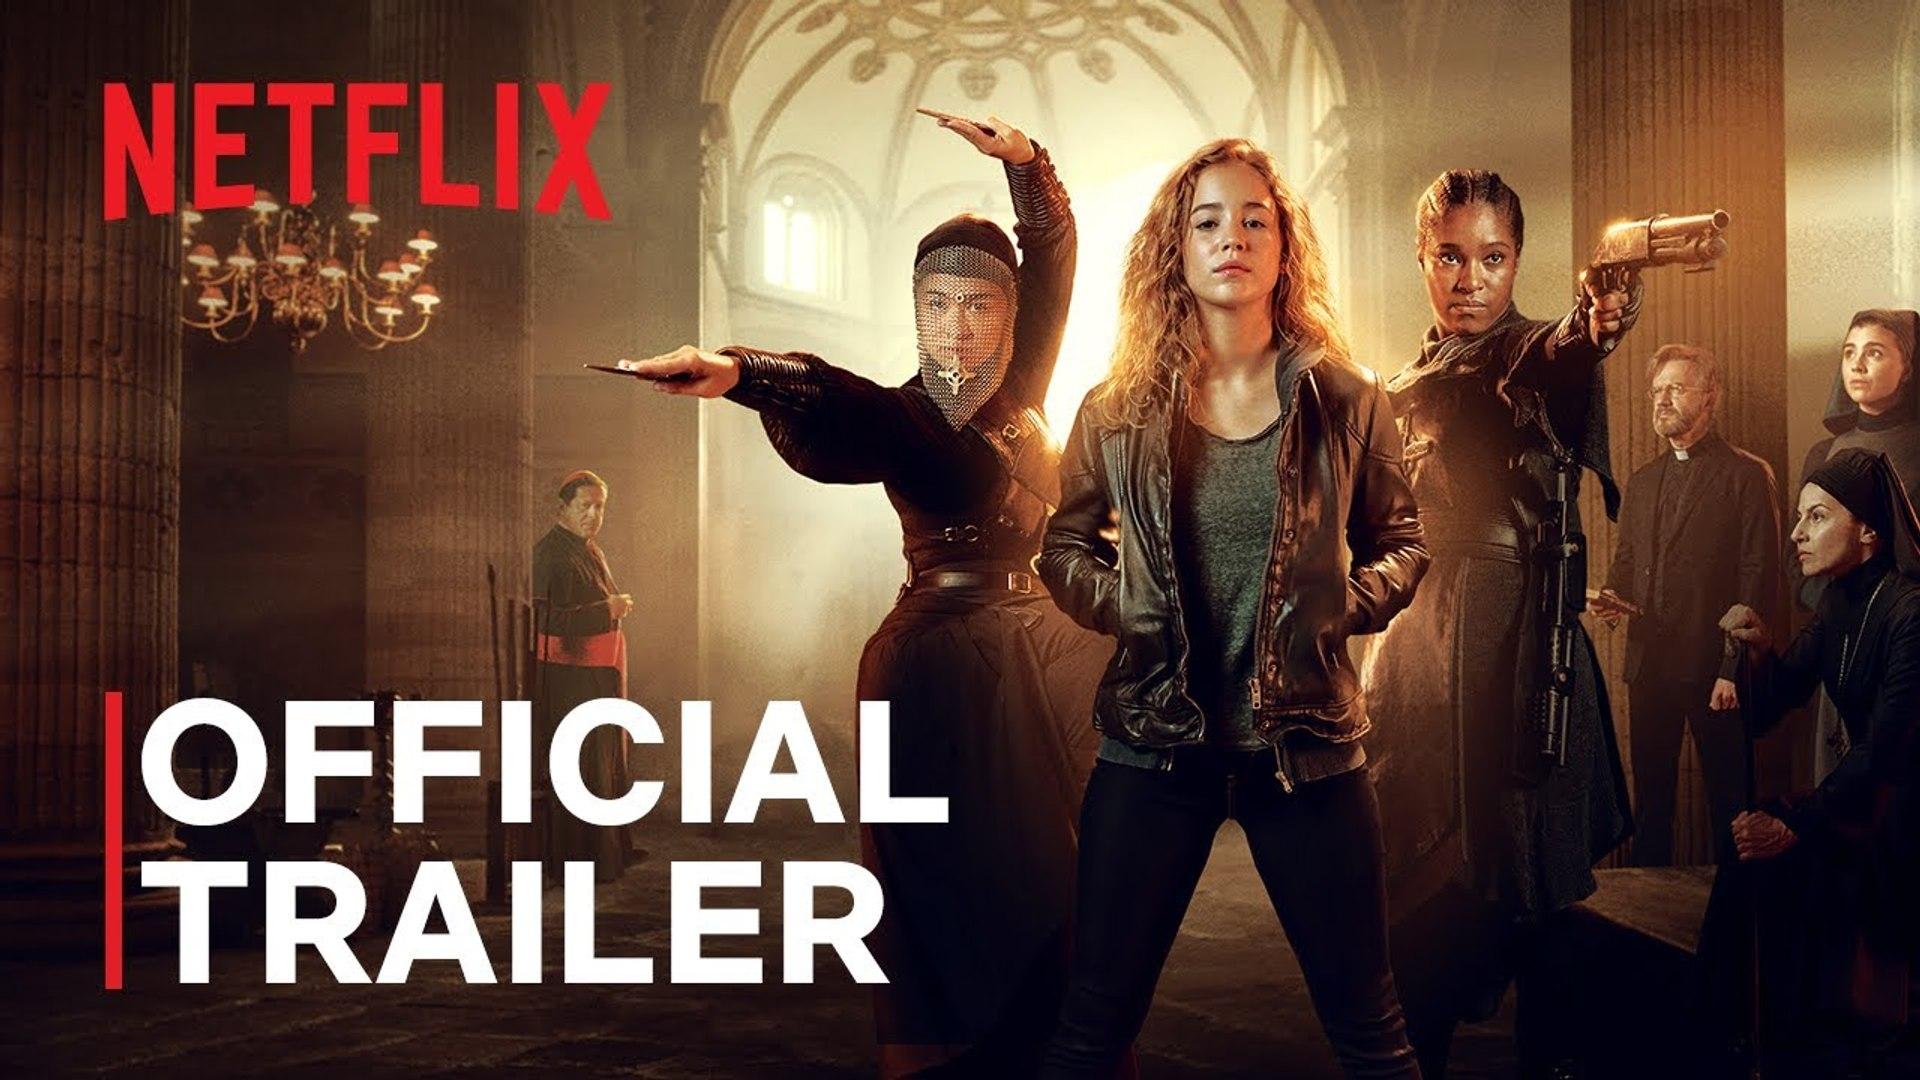 Warrior Nun Official Trailer (2020) Alba Baptista,Toya Turner Netflix Series